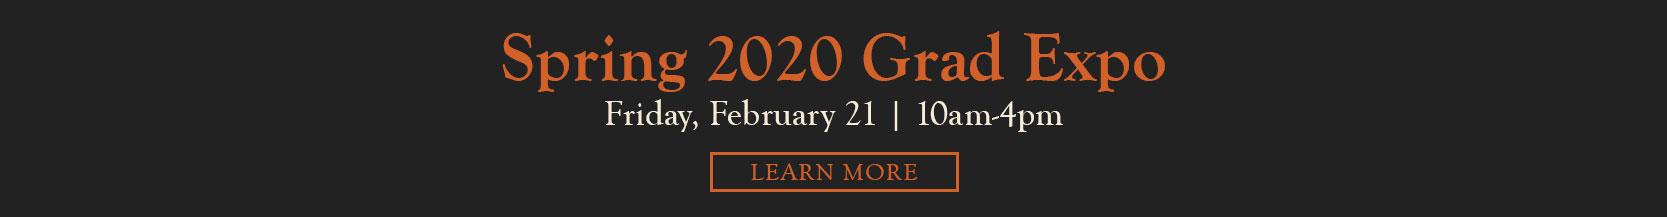 Spring 2020 Grad Expo